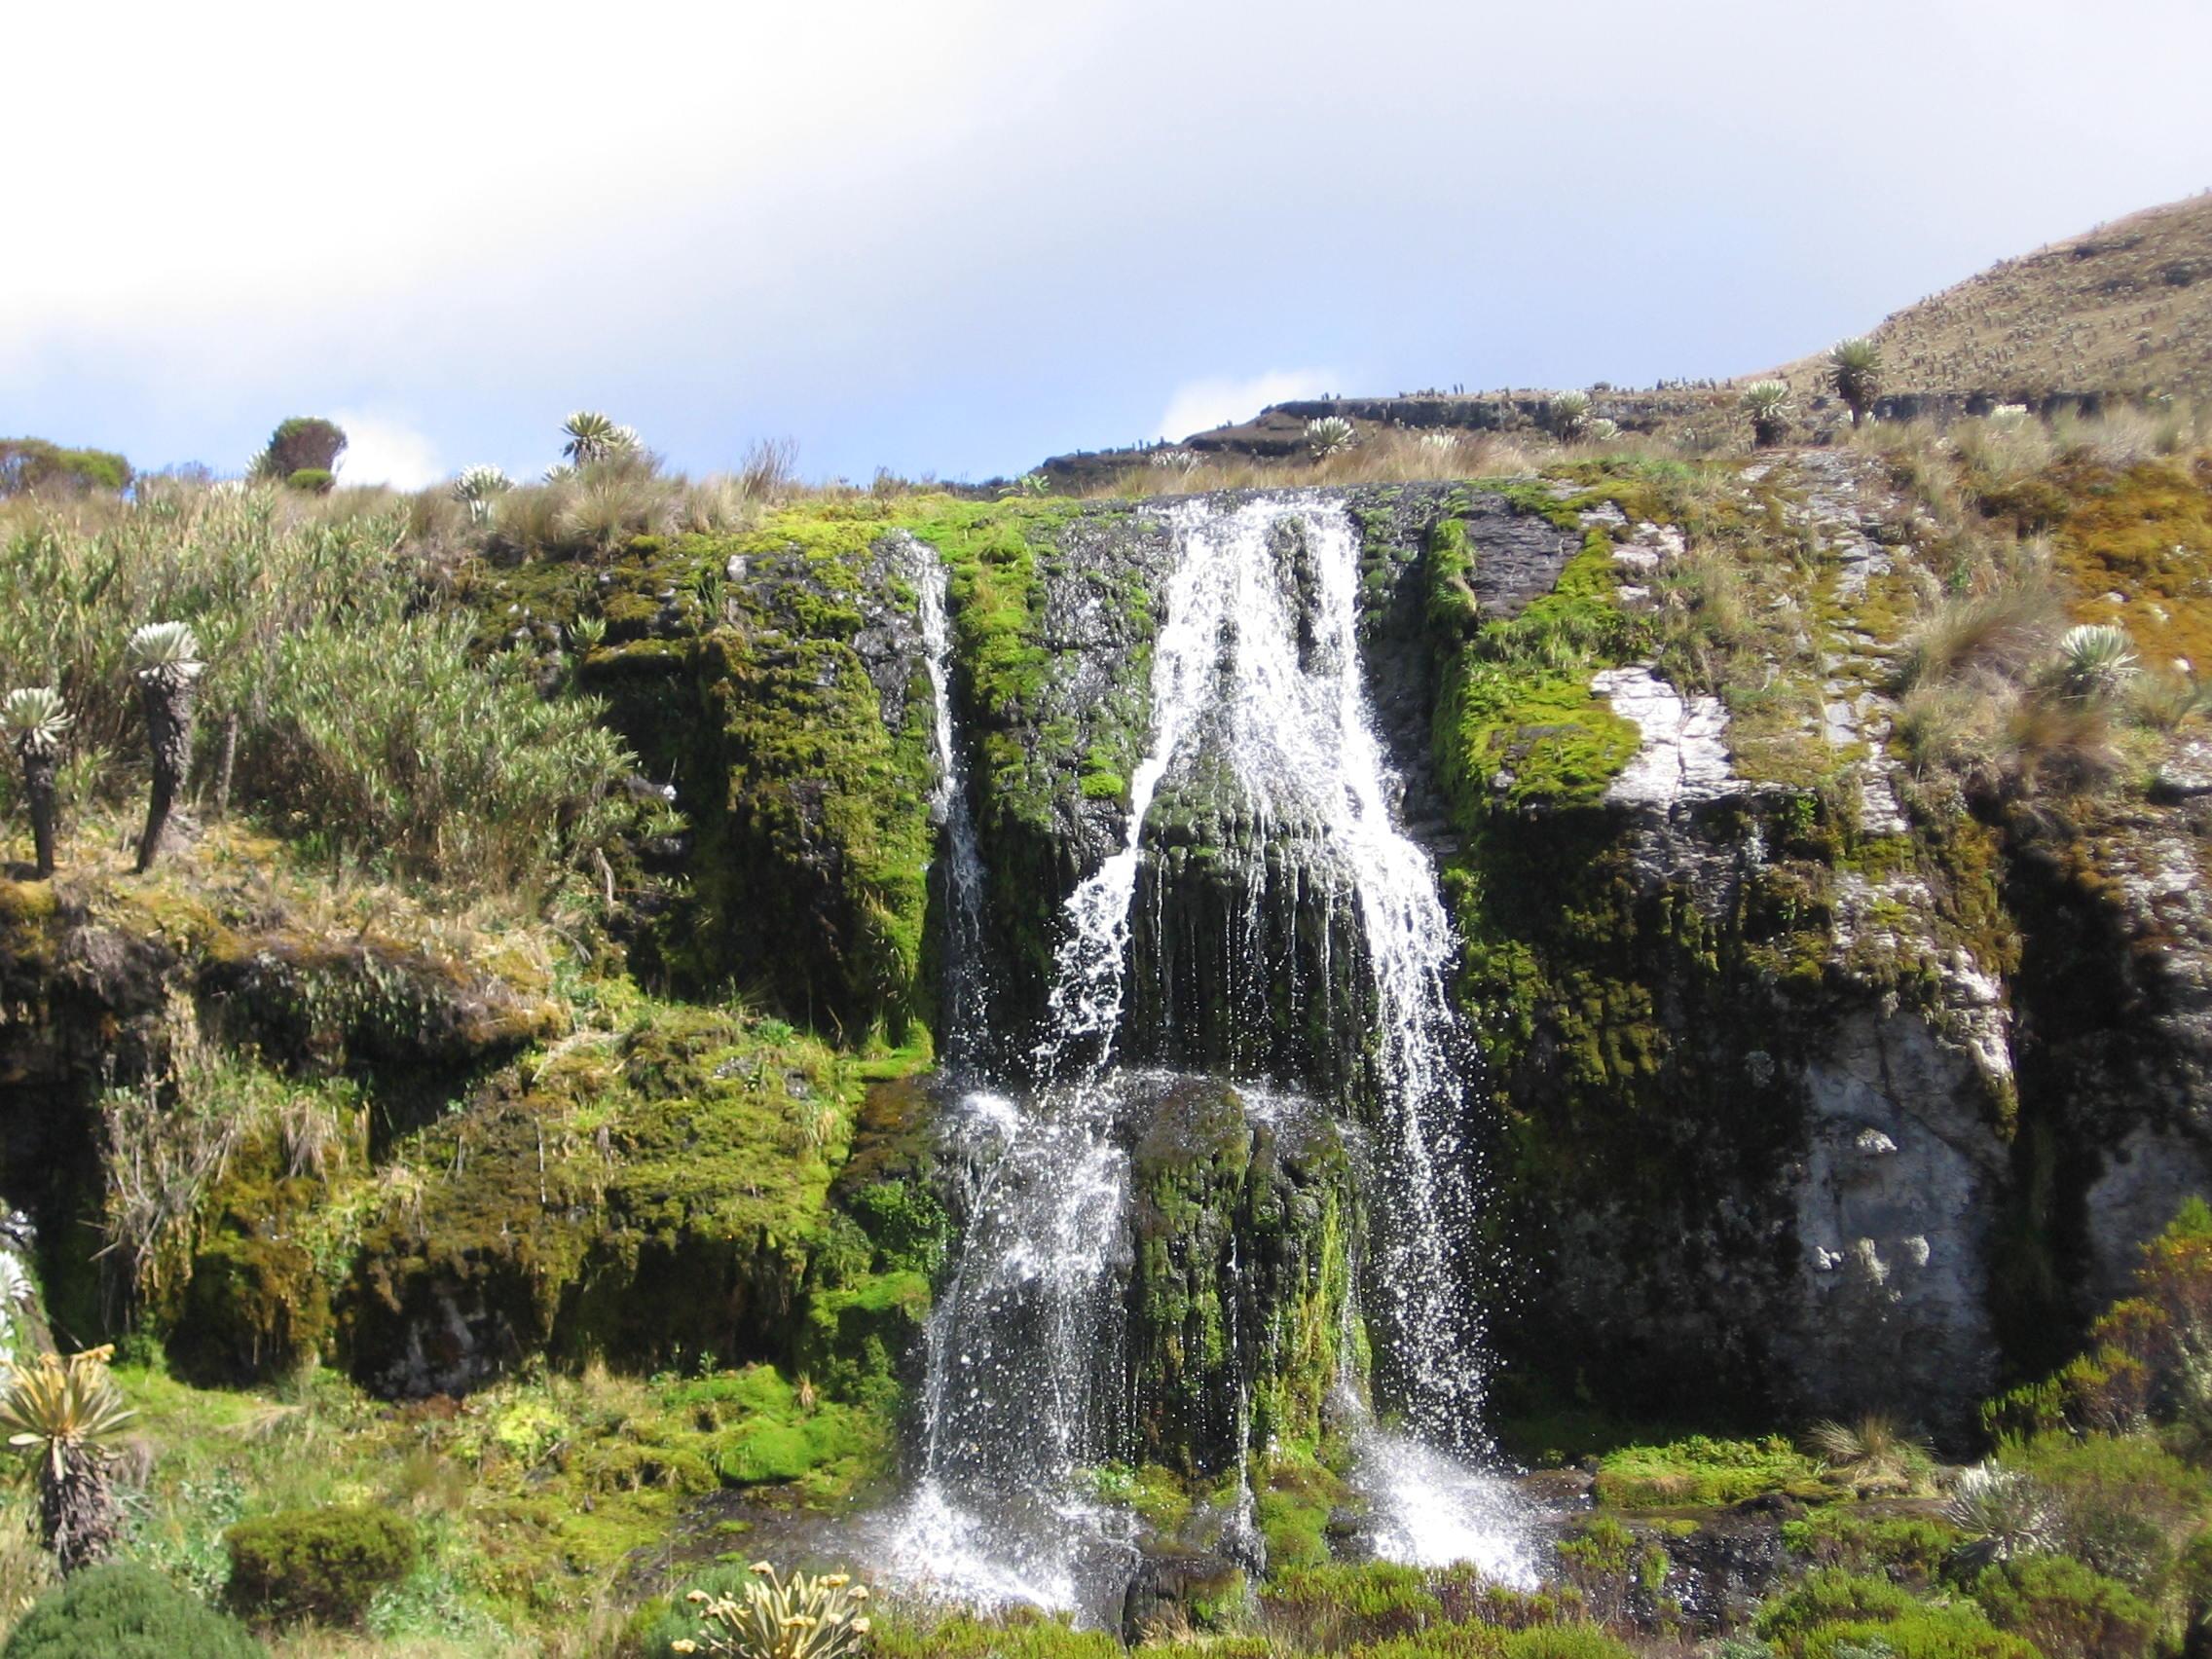 Cascada de Penagos Paramo de Oceta - Manuel galvis rueda